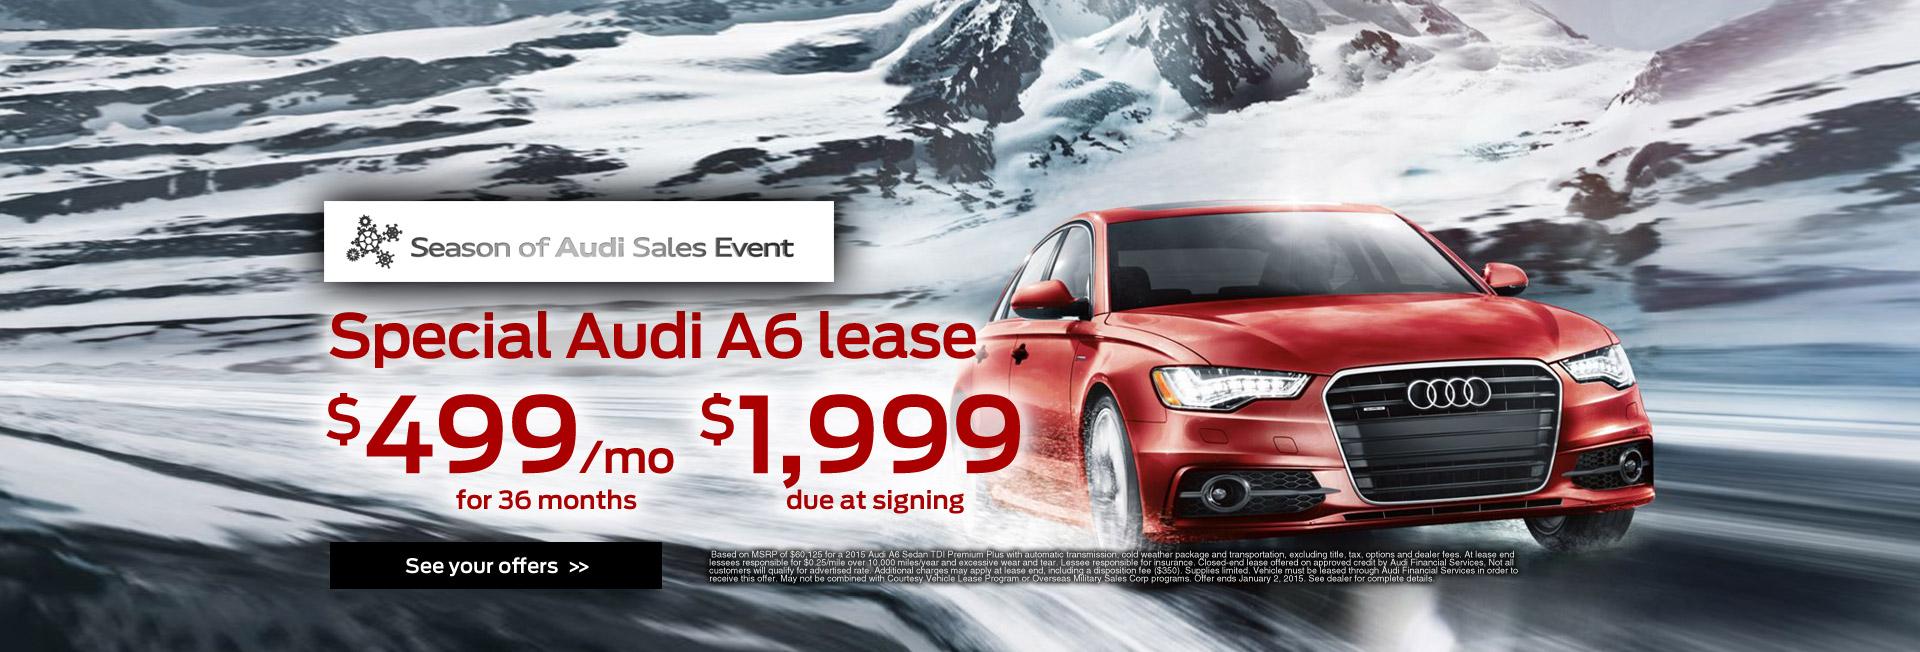 Audi Sales Event A6